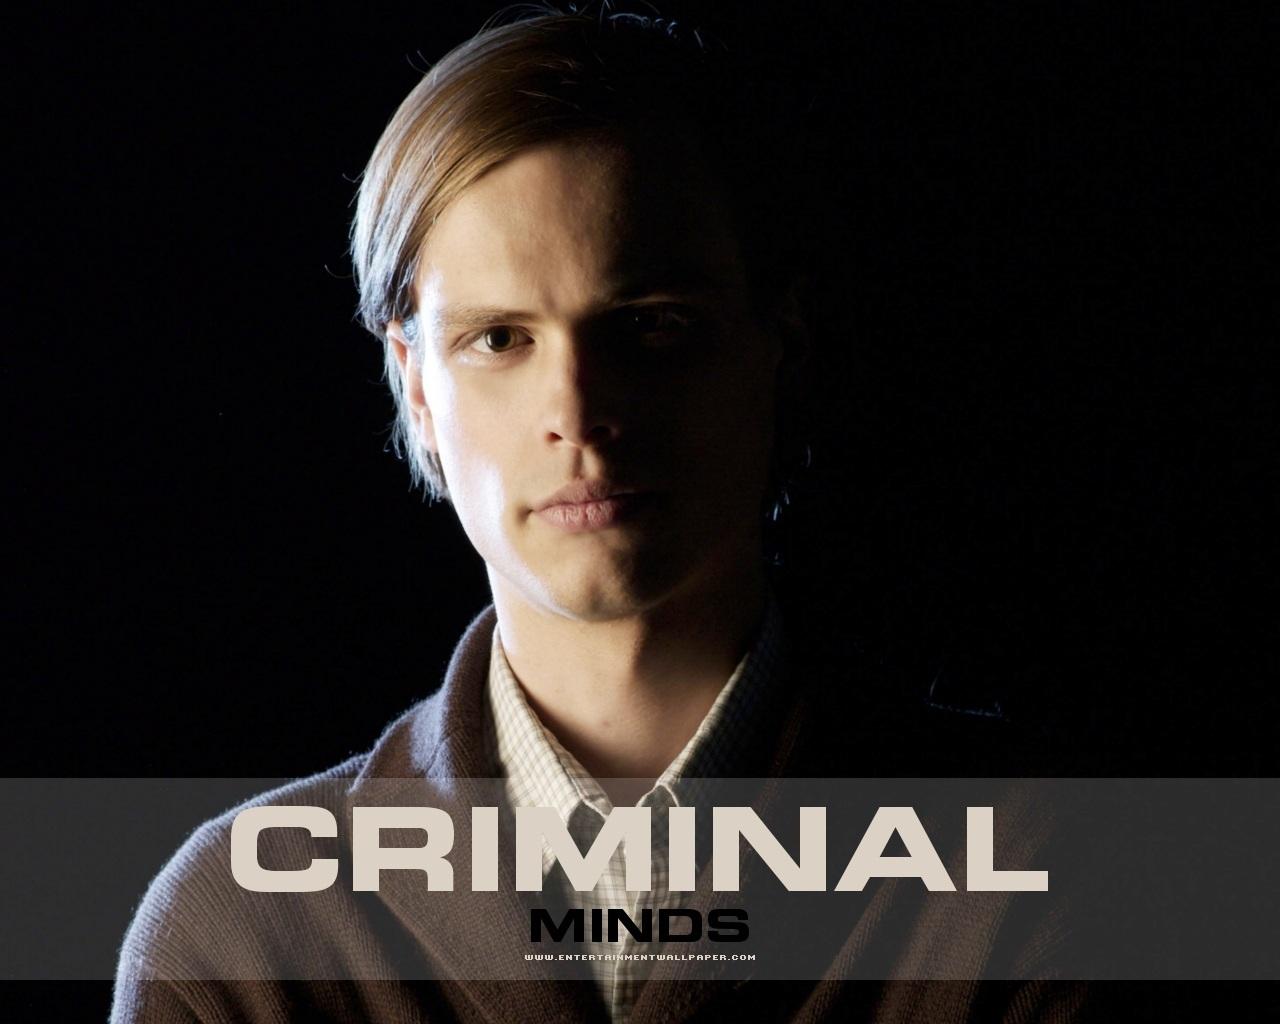 criminal minds criminal minds wallpaper 2953194 fanpop